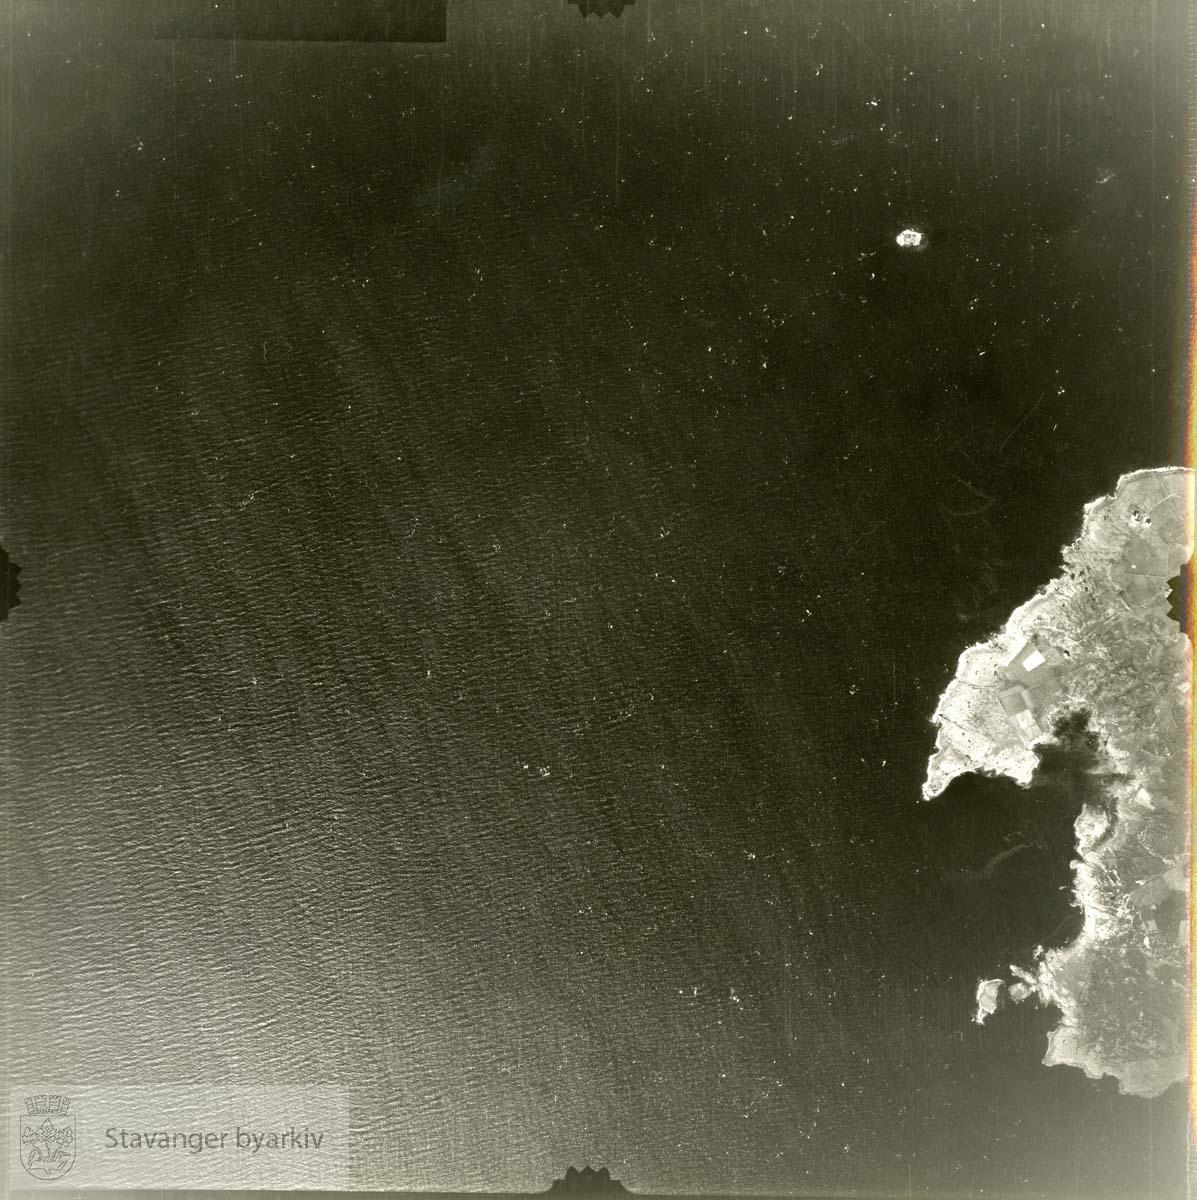 Jfr. kart/fotoplan A(III) 42/339..Holmaviga, Holmodden, Tungenes..Se ByStW_Uca_002 (kan lastes ned under fanen for kart på Stavangerbilder)